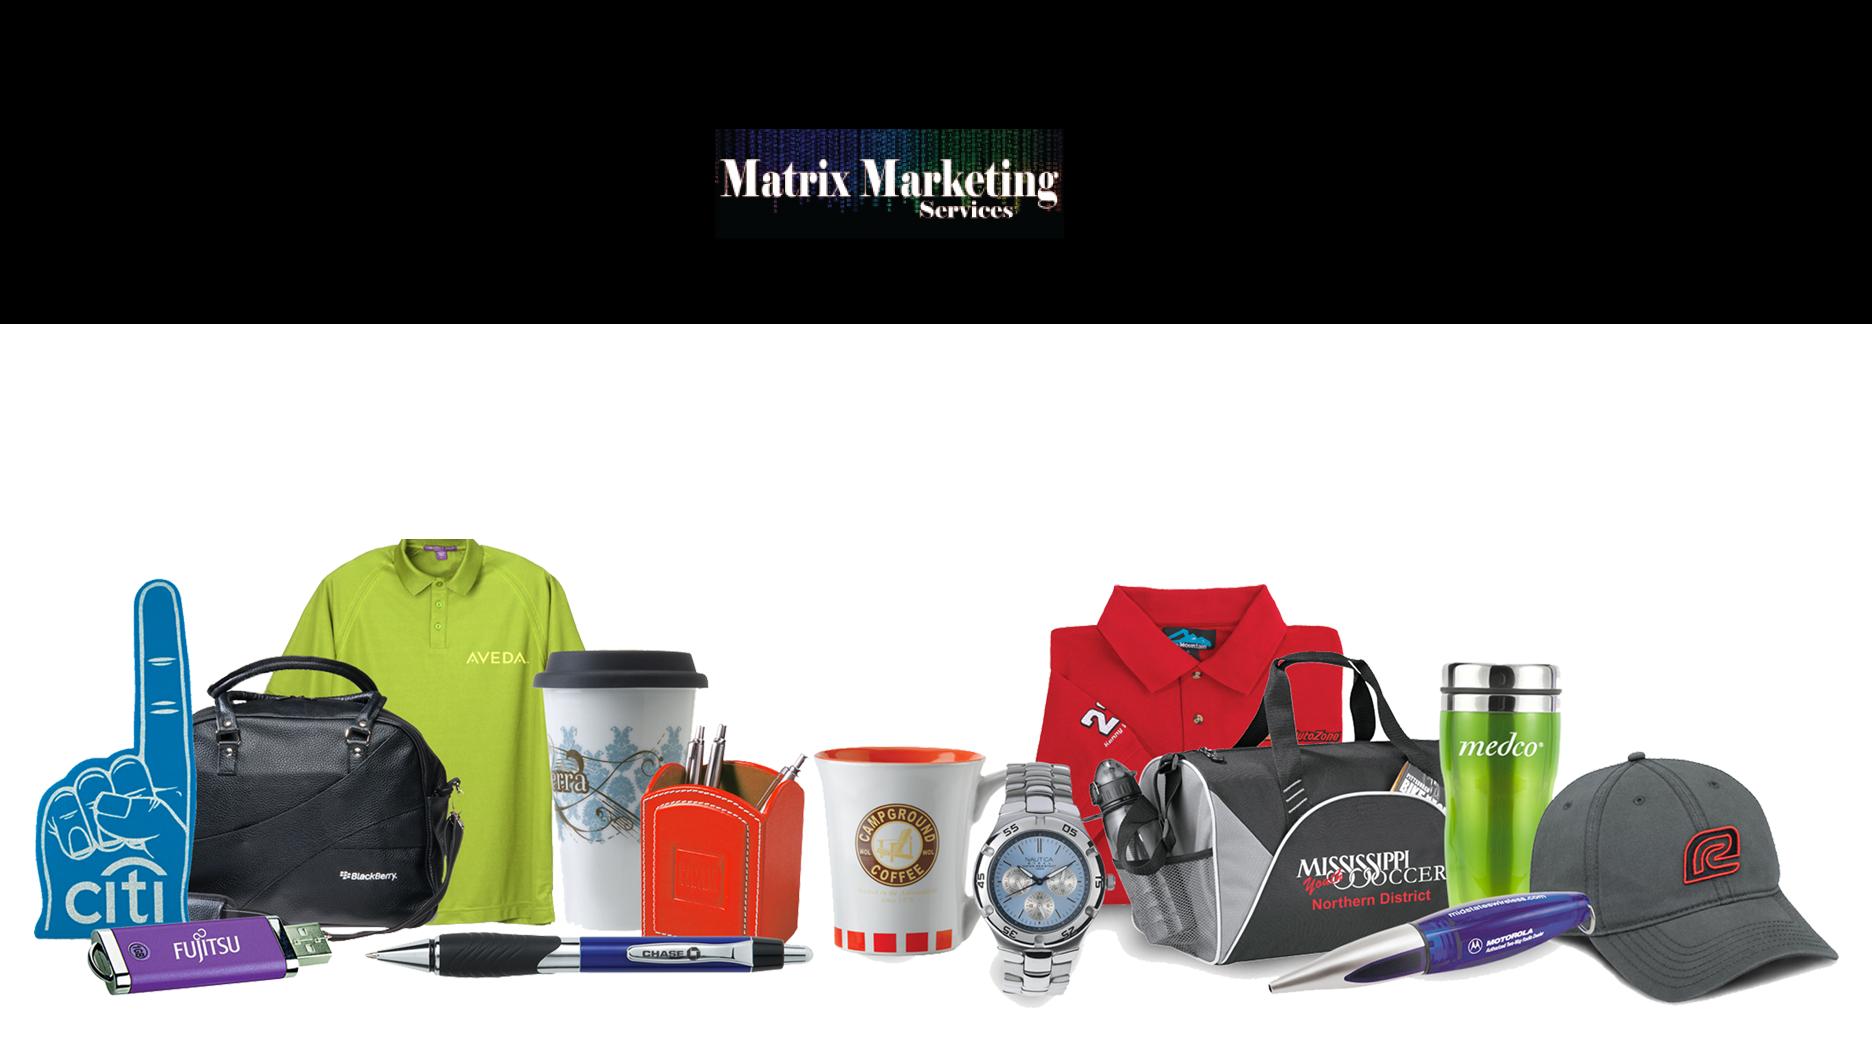 Matrix Marketing Service image 4